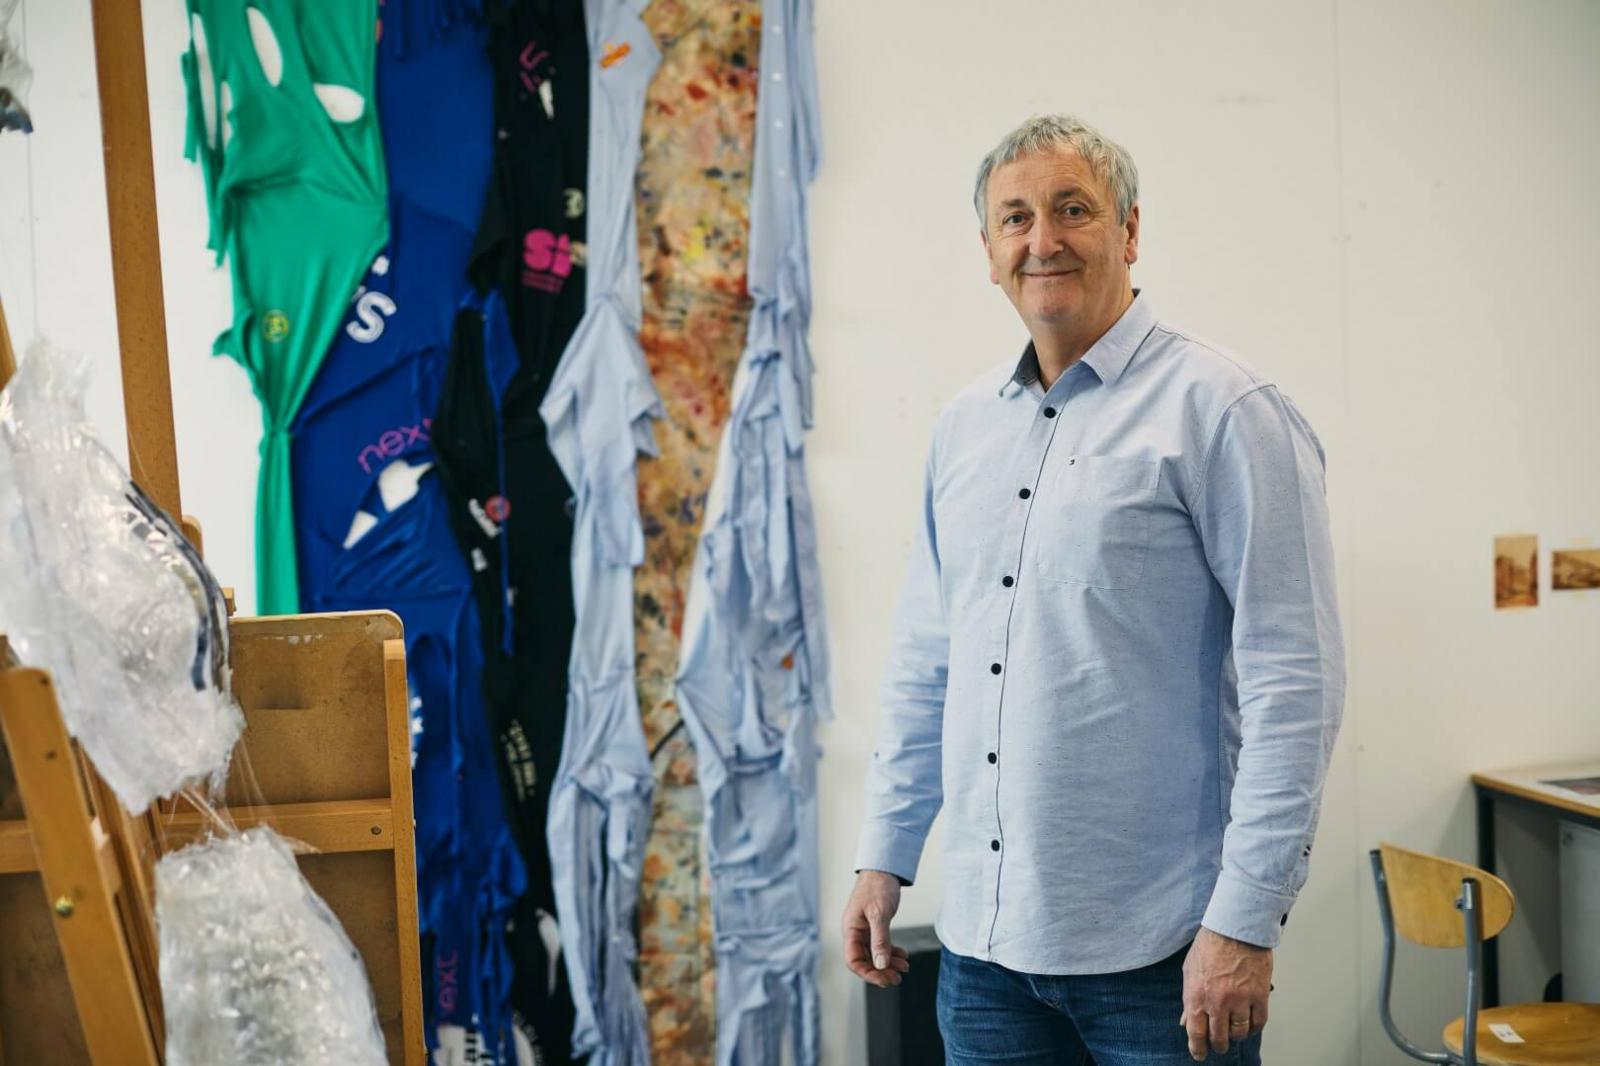 Fine art lecturer Dr Tony Charles